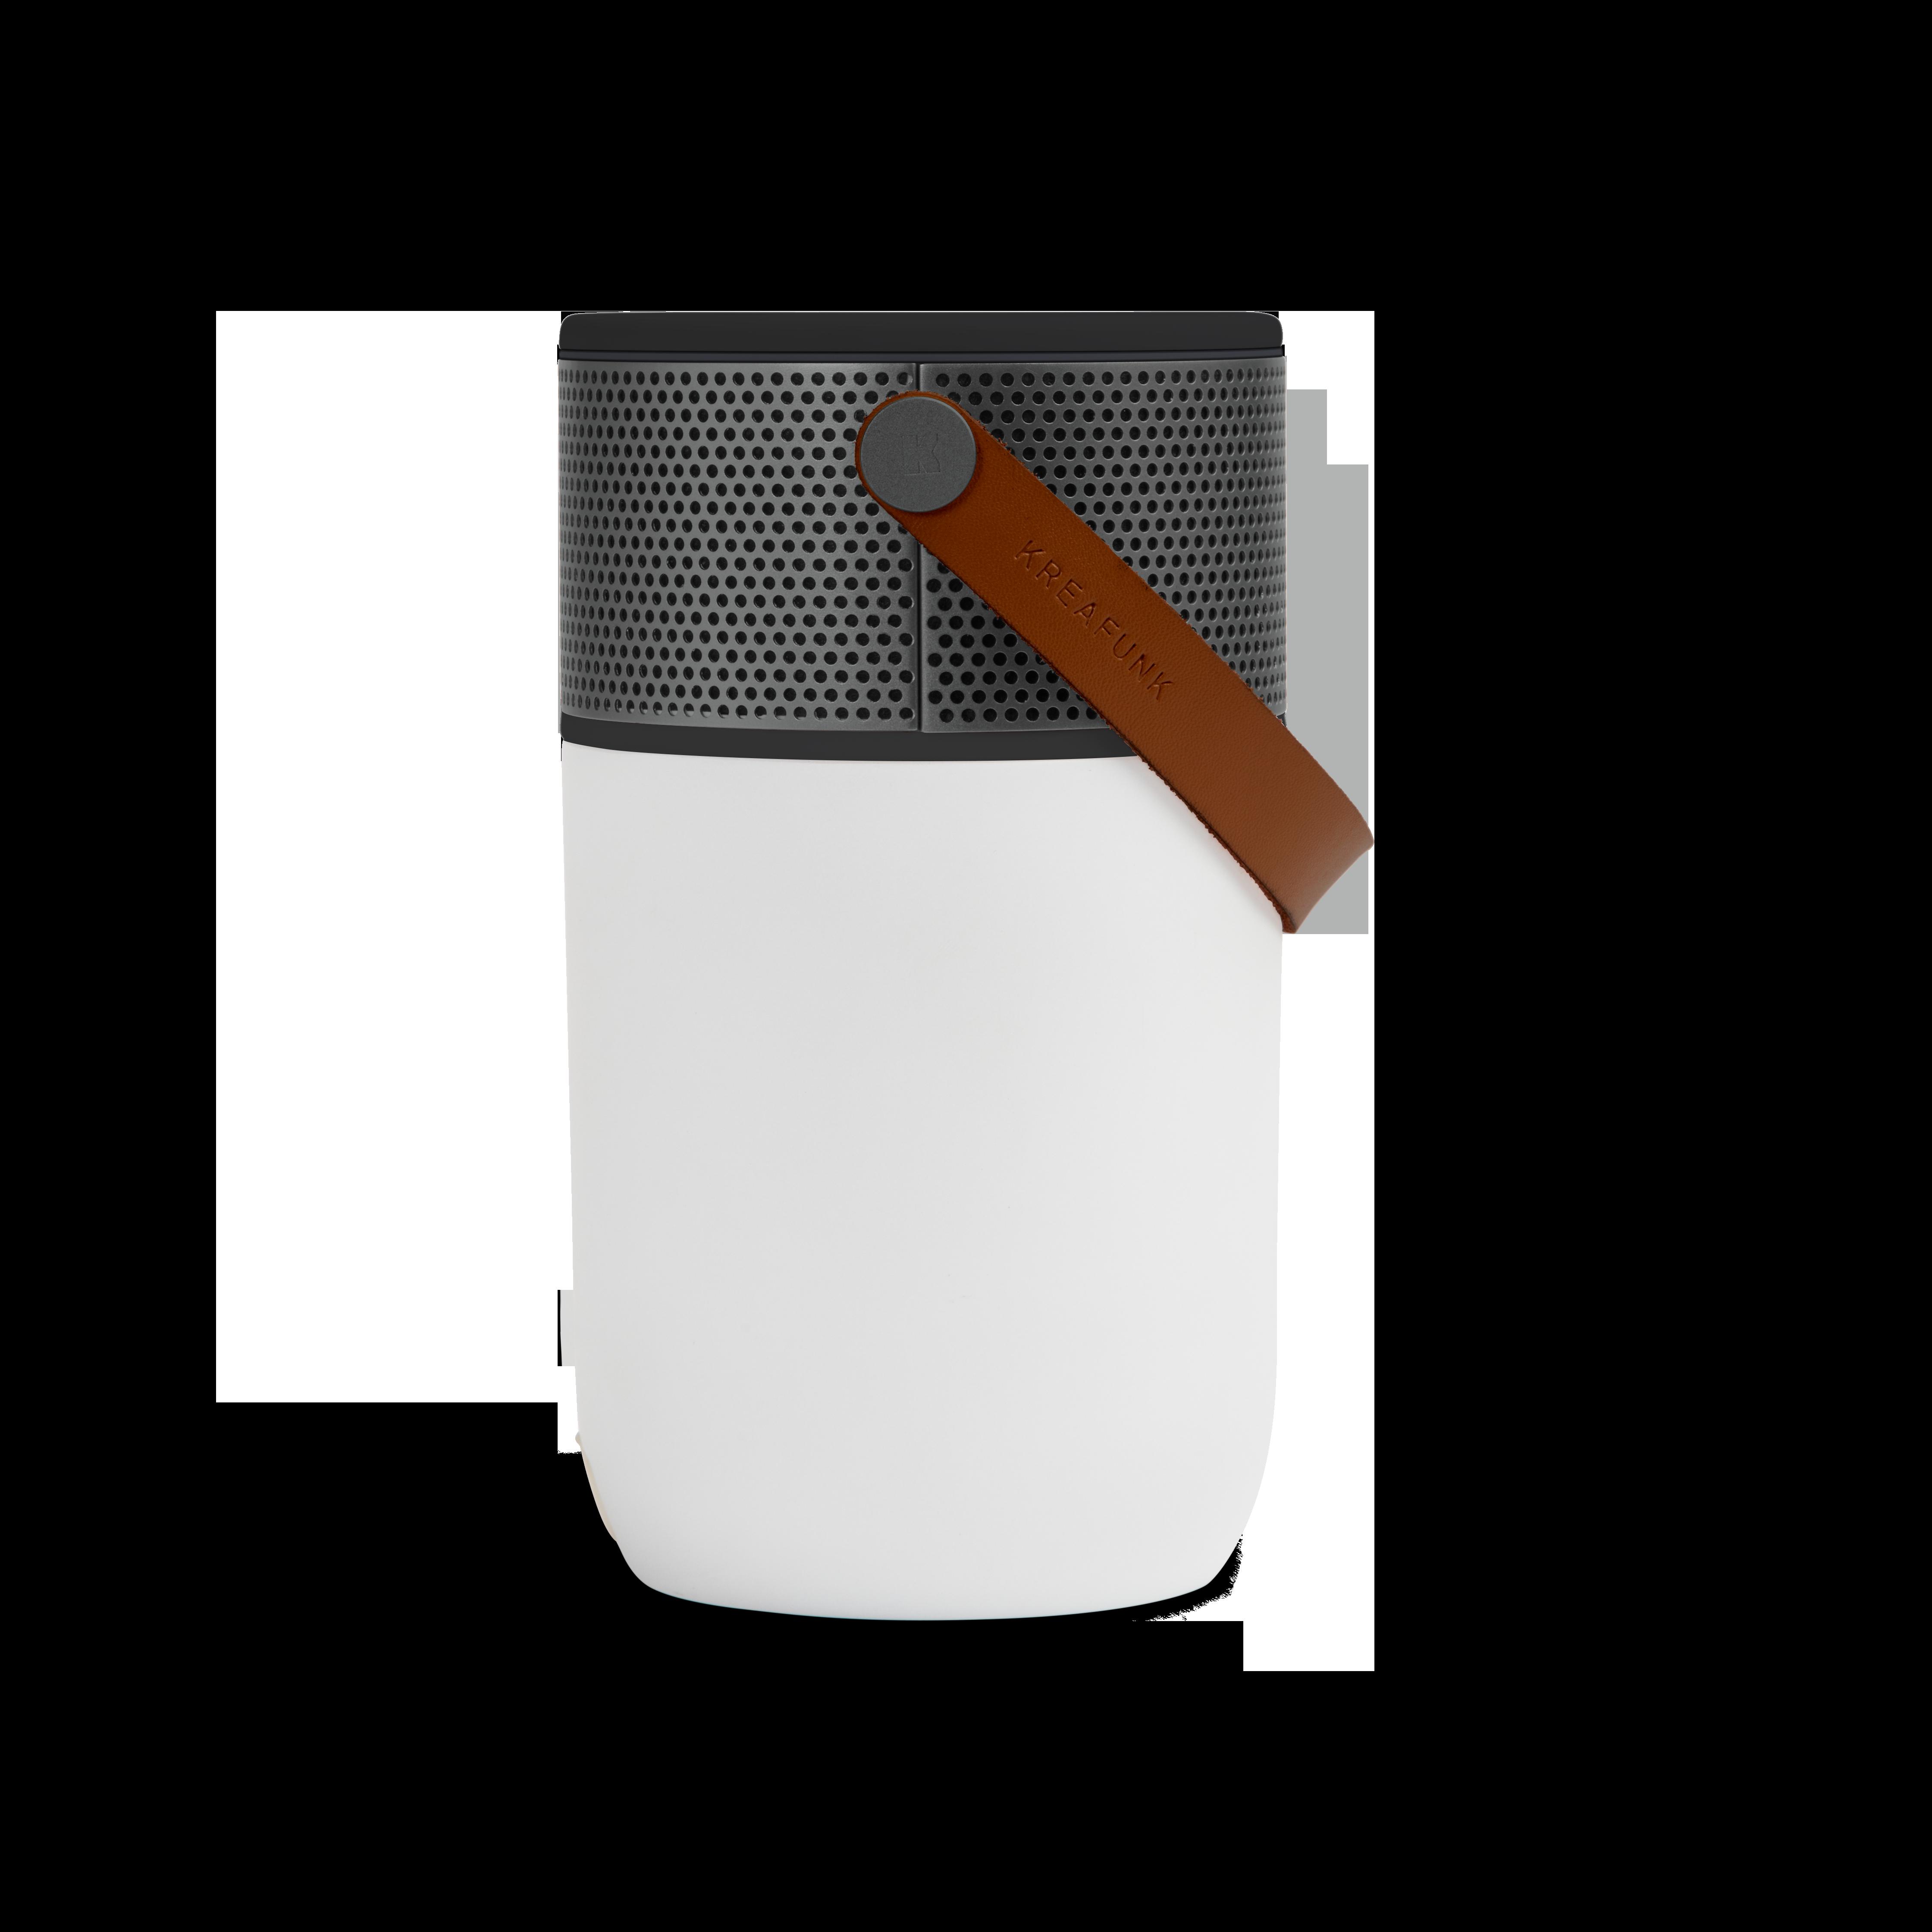 Kreafunk aGLOW Bluetooth högtalare, black edition